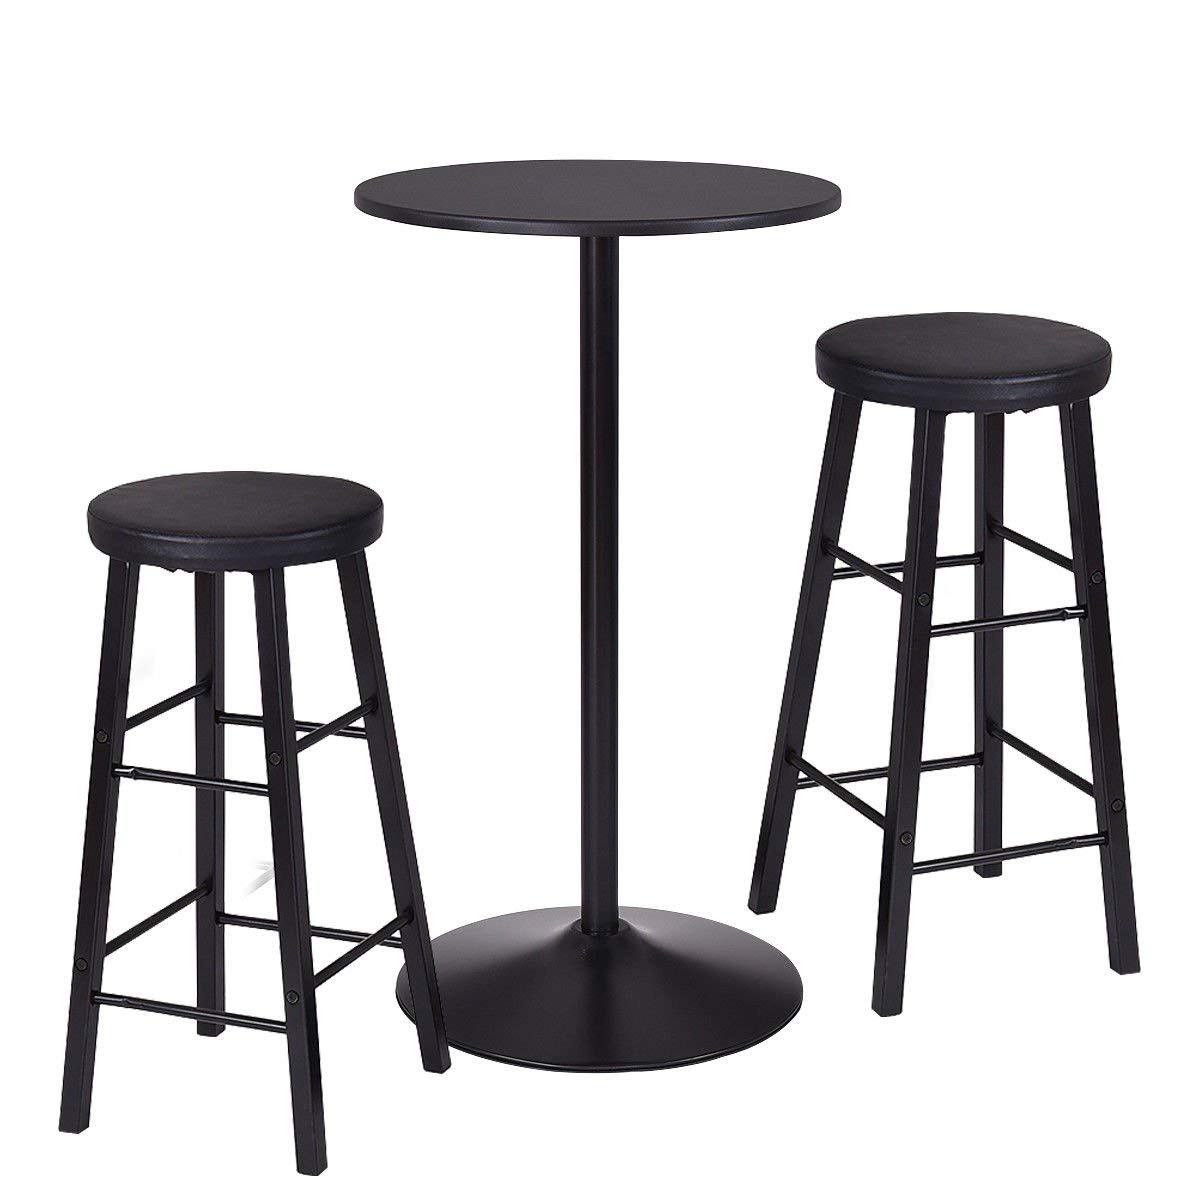 cheap black kitchen bar stools find black kitchen bar stools deals